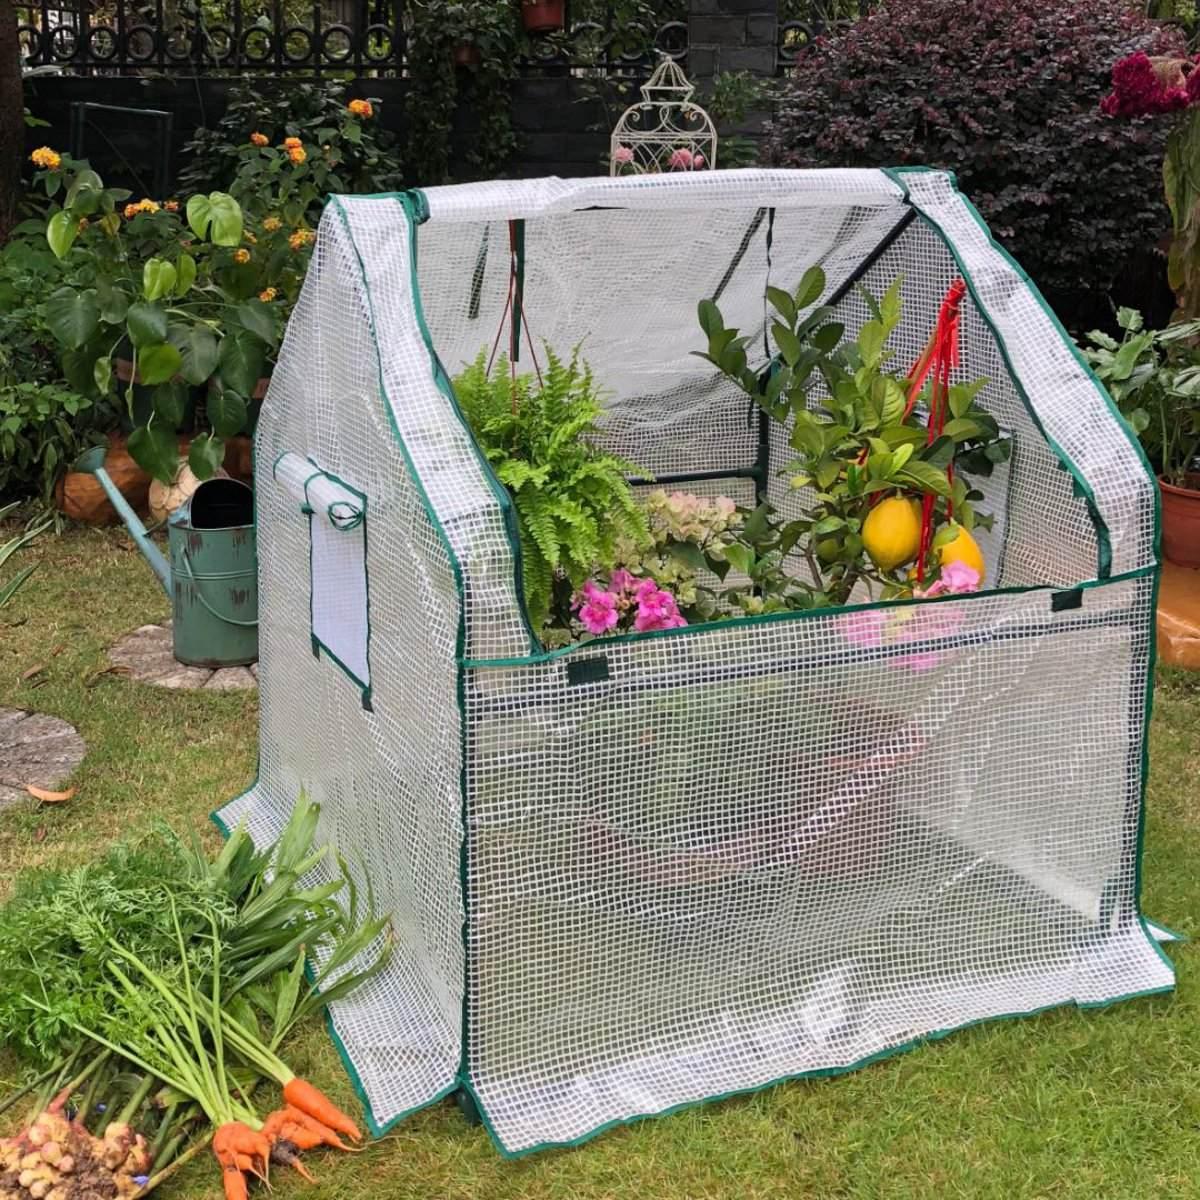 Mini Greenhouse 90x90x90cm Home Outdoor Flowers Plants Gardening Room Winter Warm Shelter Shade Balcony Garden Greenhouse Kit